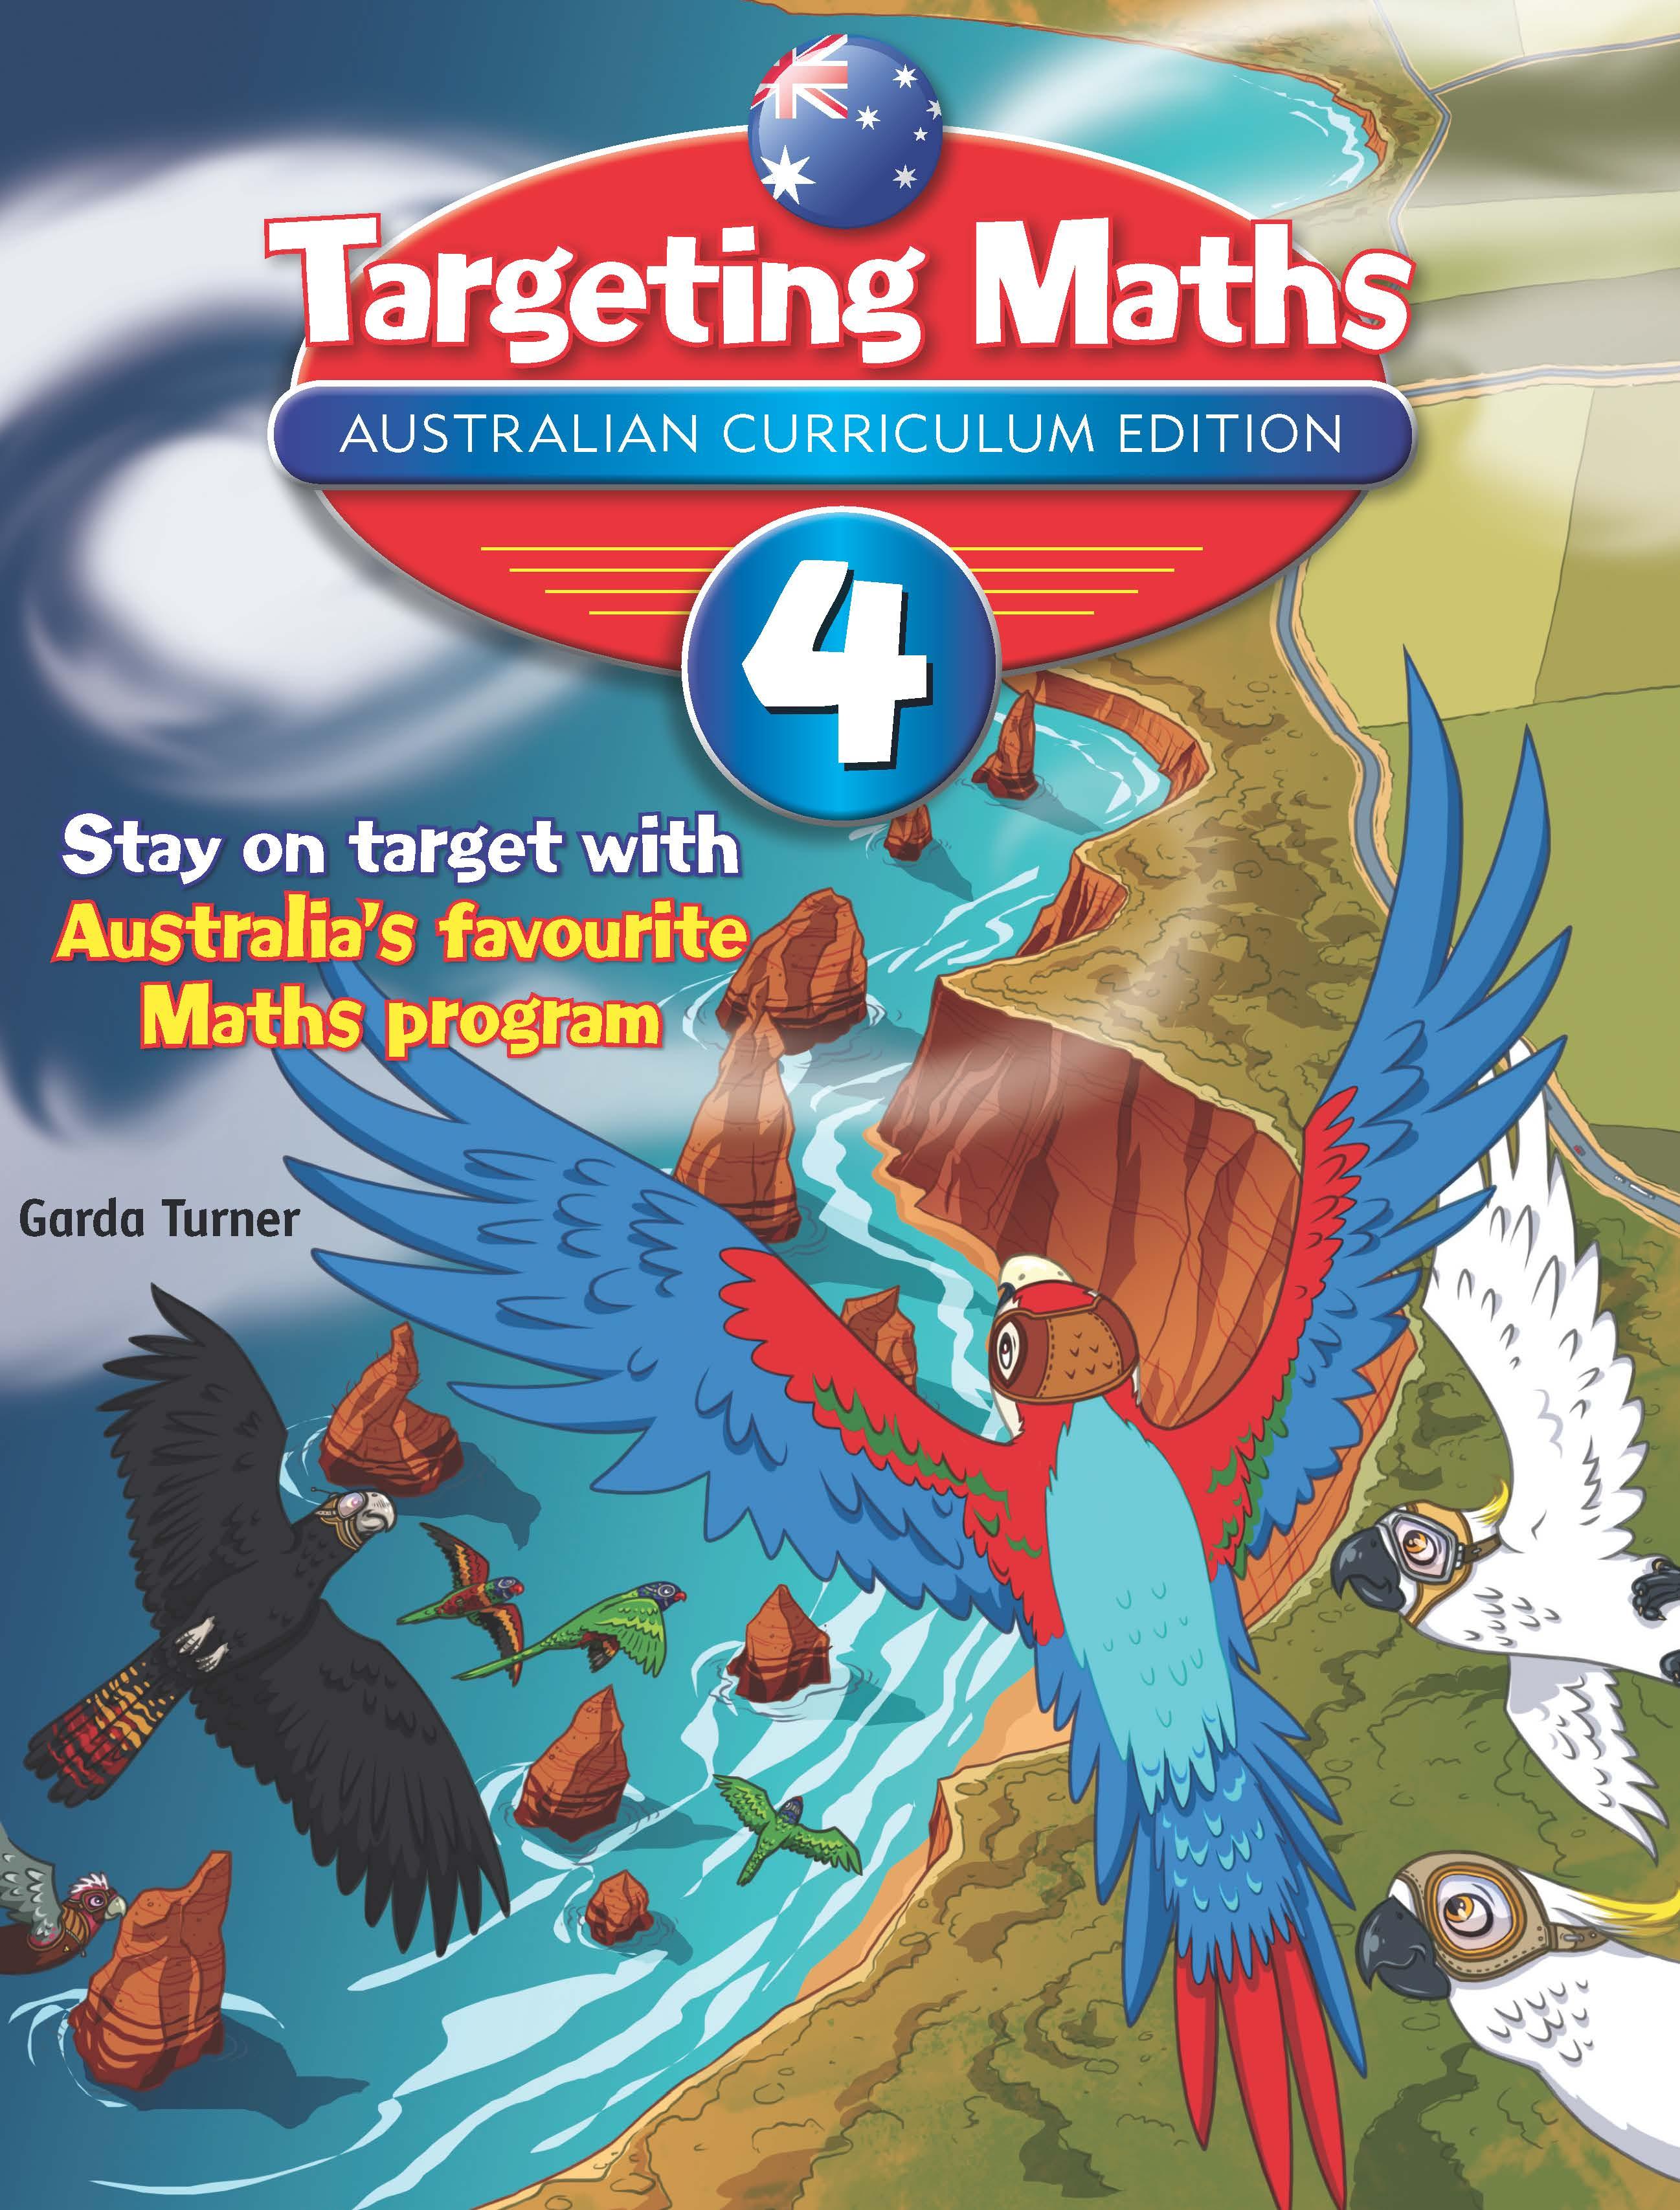 Targeting Maths Australian Curriculum Edition Student Book Year 4